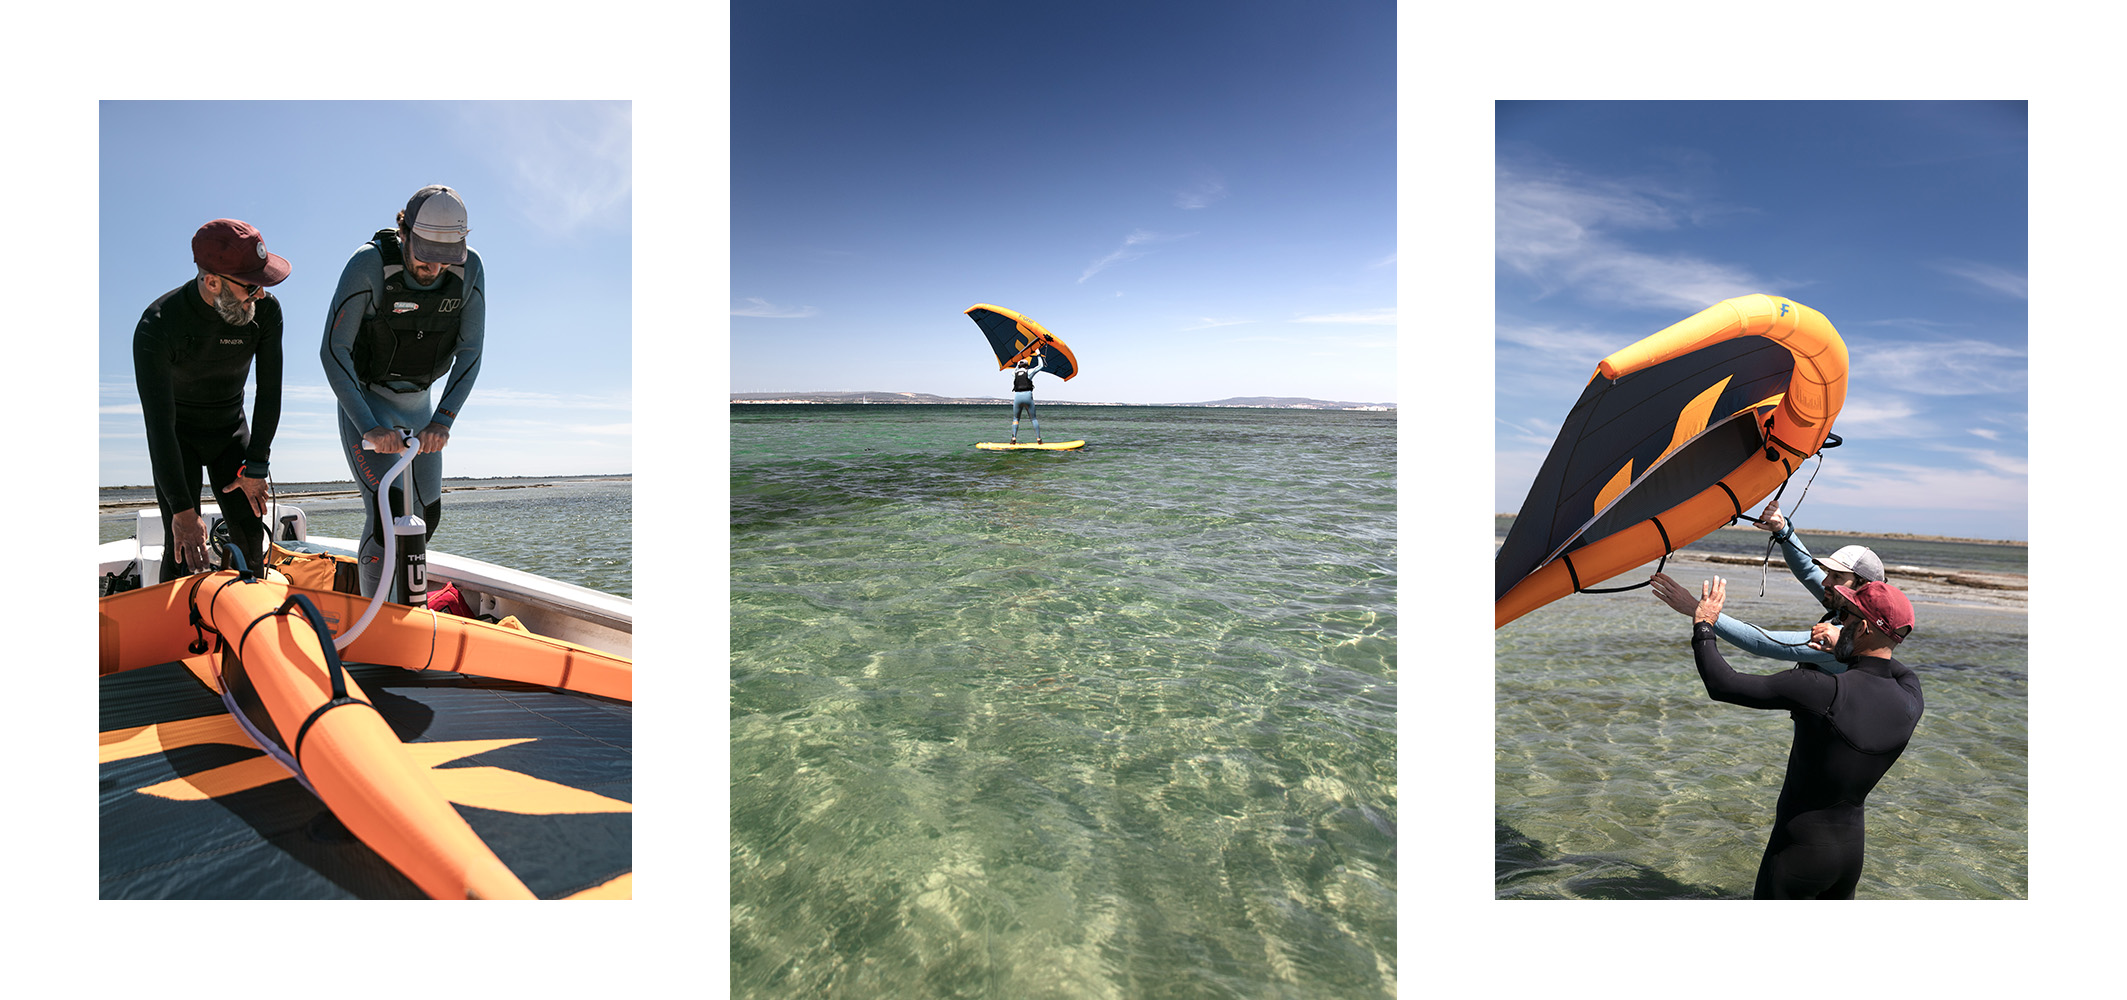 Où apprendre le wingsurf en France ?